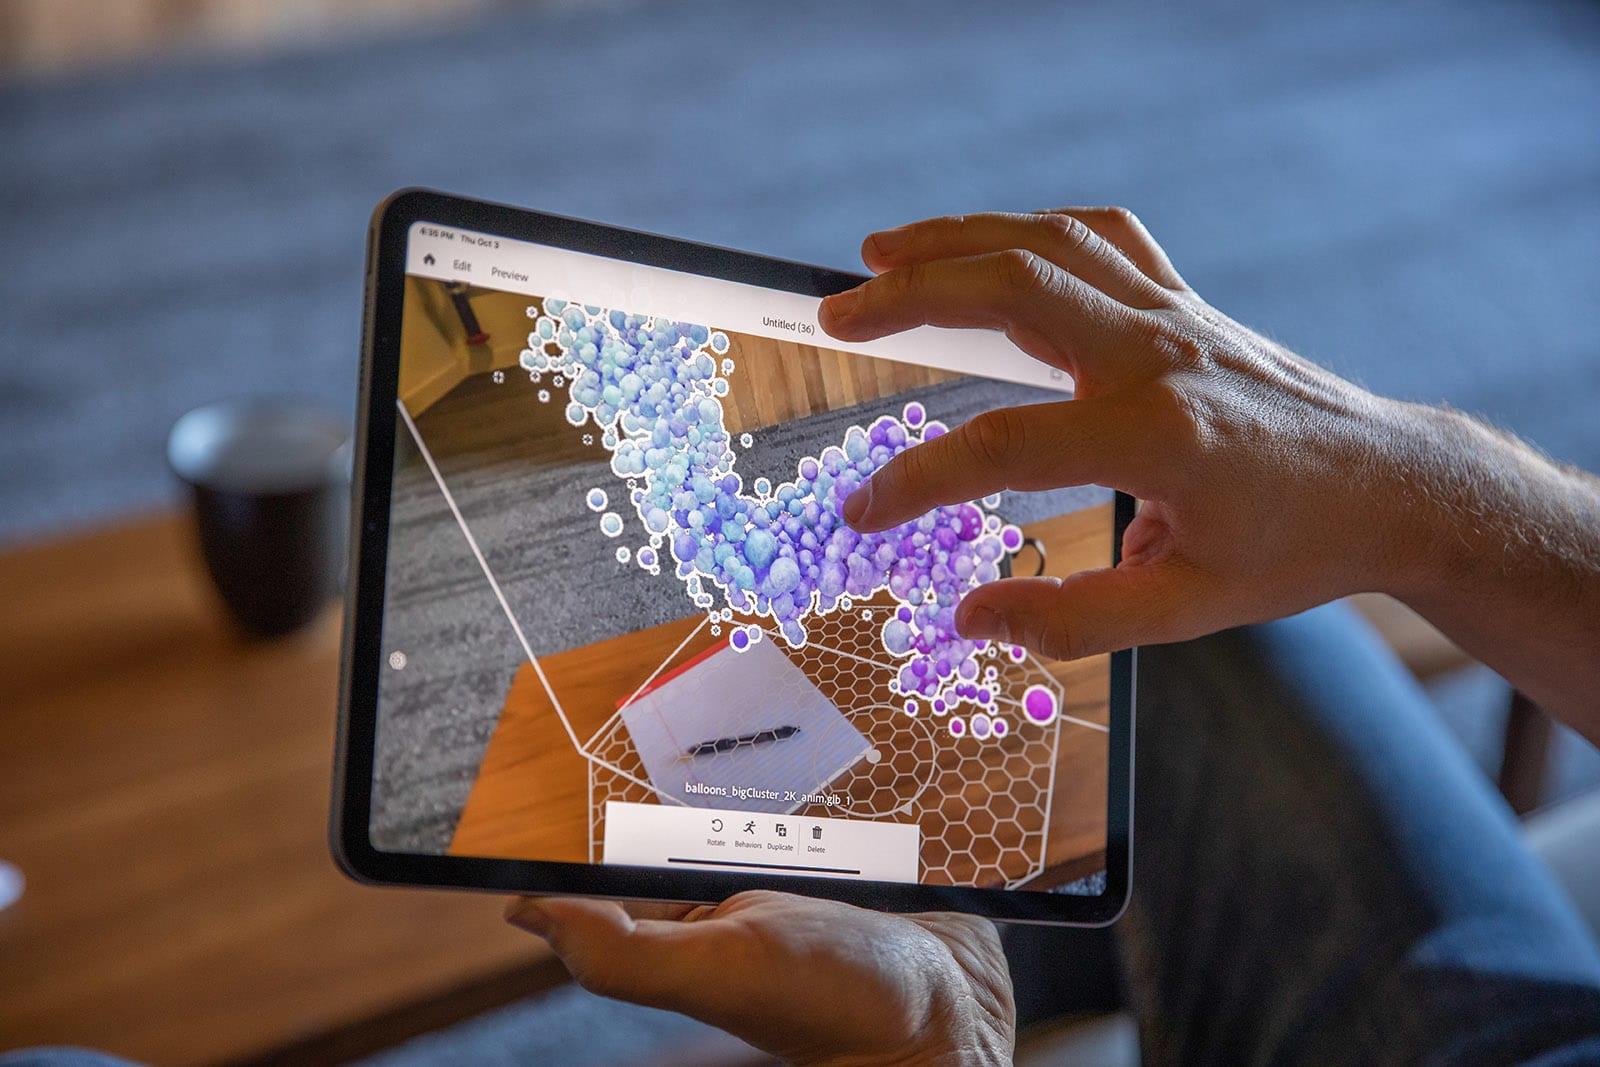 Adobe Aero AR creation tool